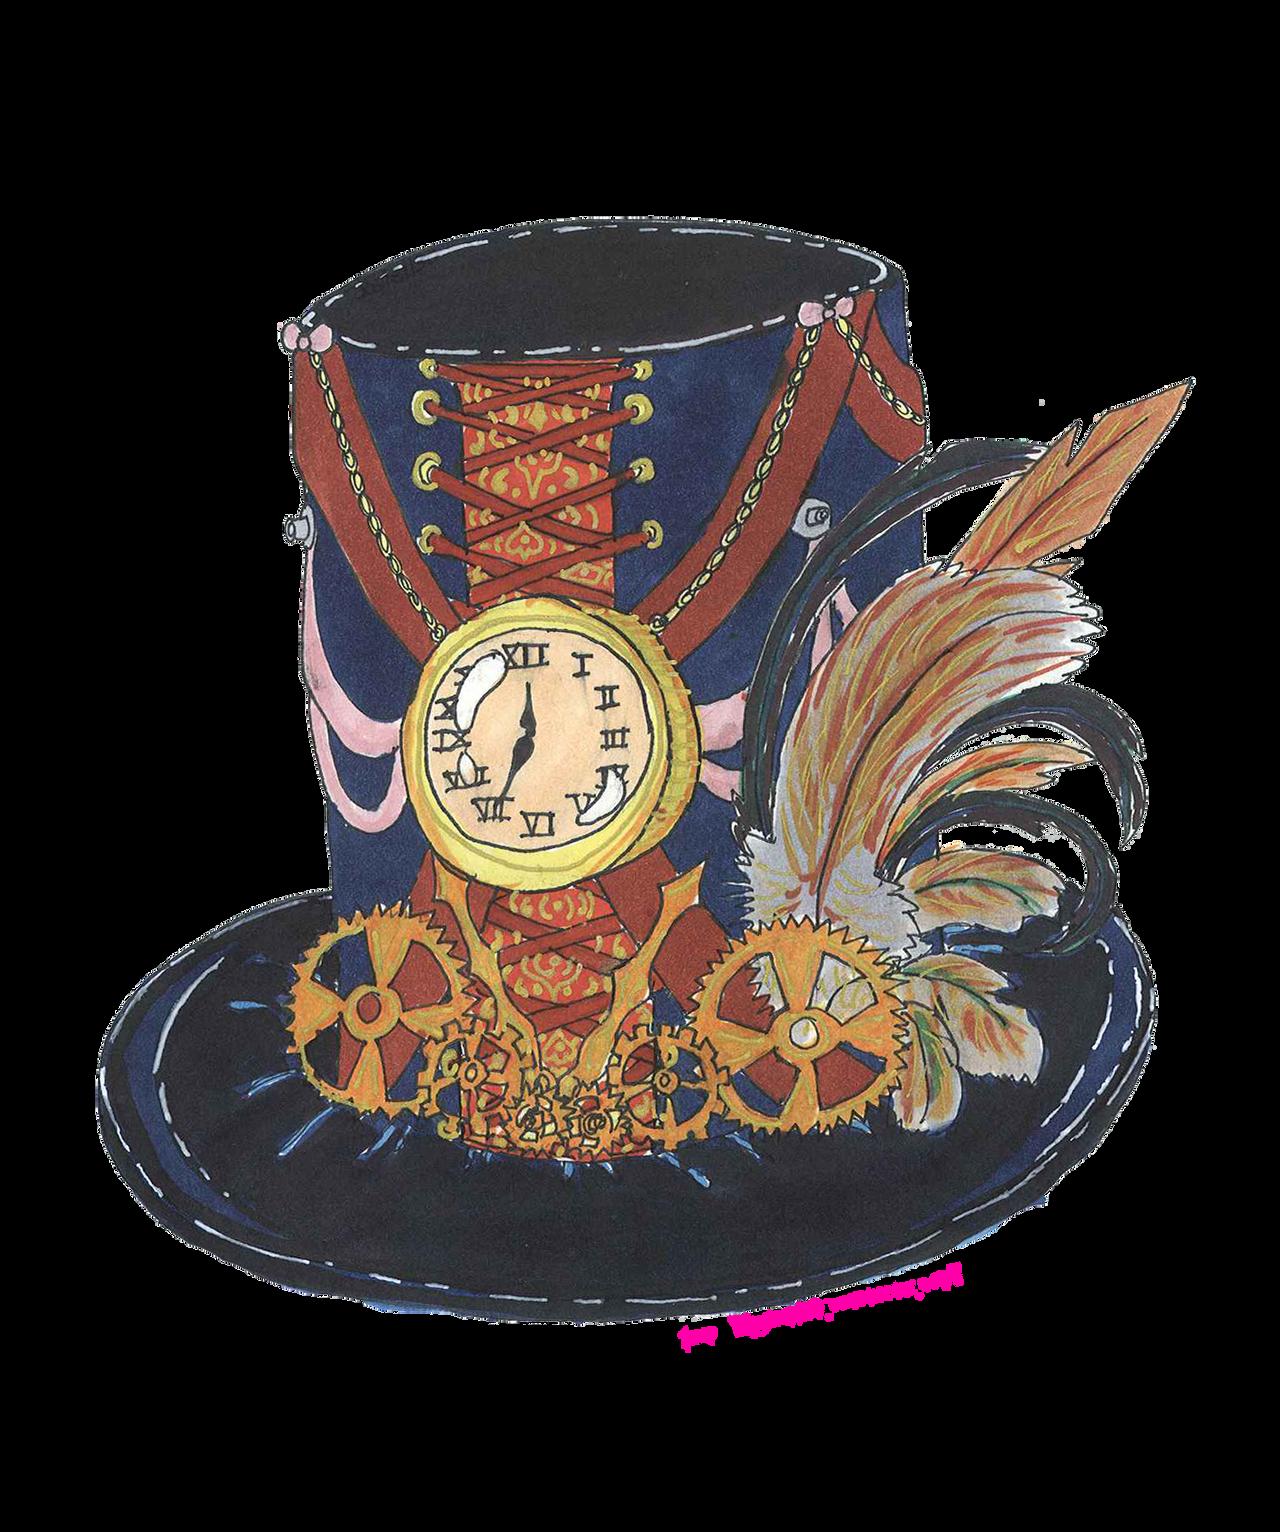 Steampunk Time Keeper Hat by josie1130